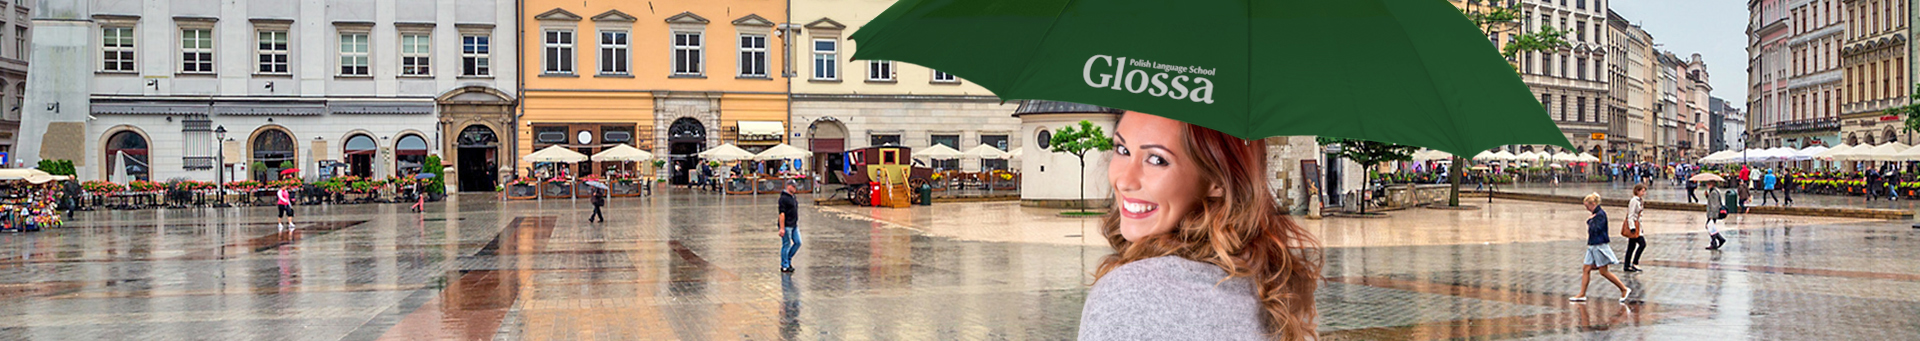 "Parasol ""Glossa"""